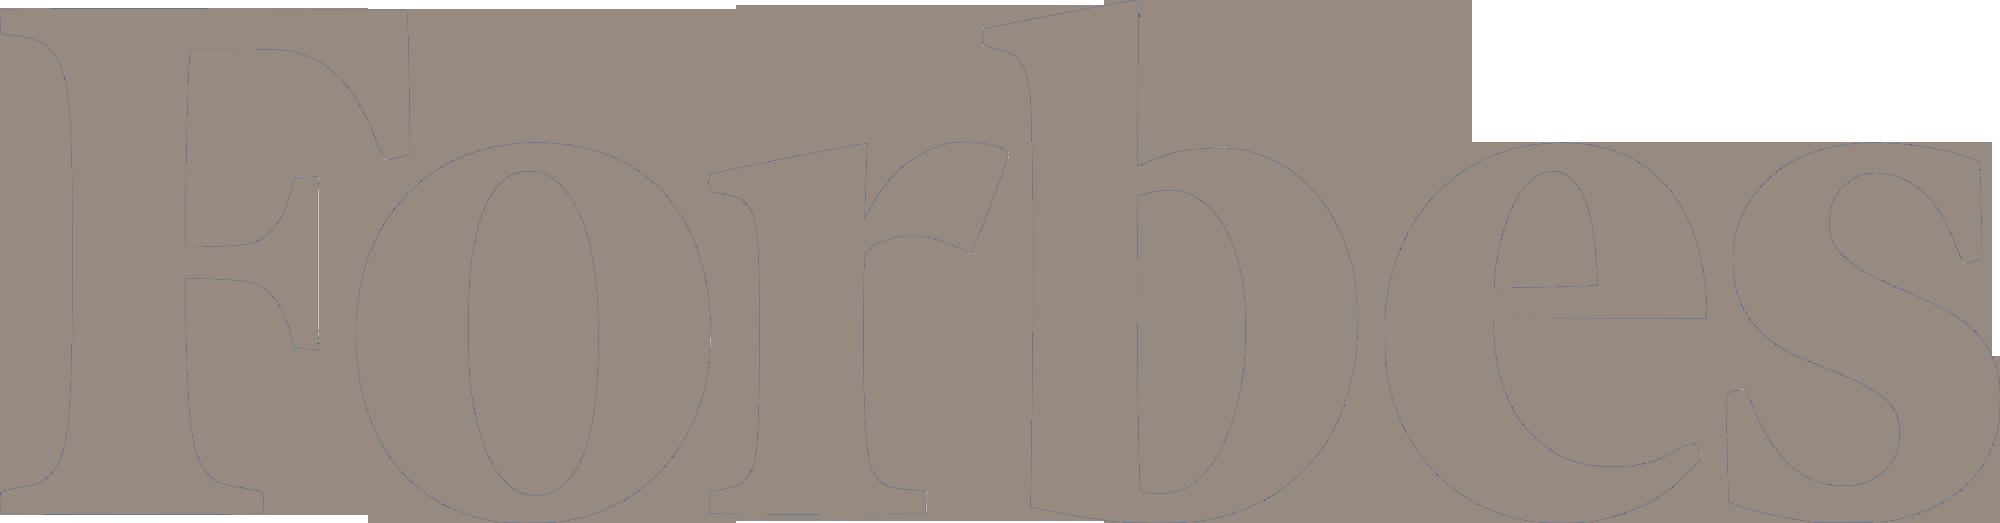 Forbeslogo.png